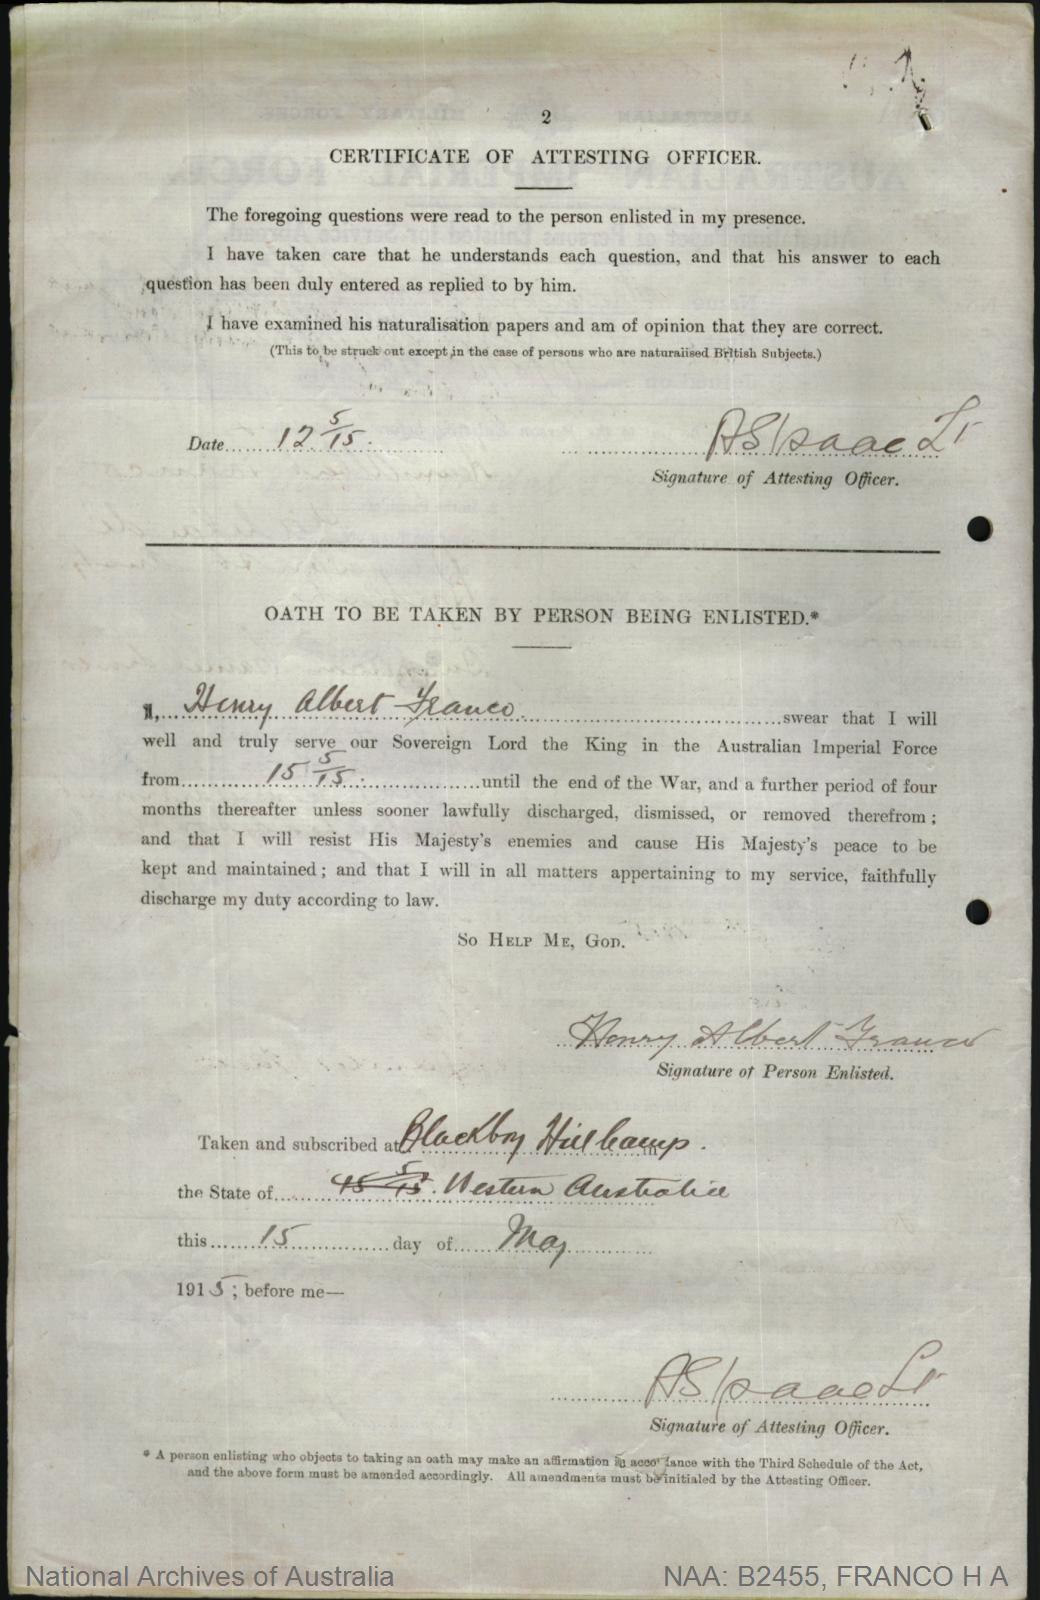 Franco Henry Albert : SERN 1098 : POB Port Adelaide SA : POE Blackboy Hill WA : NOK M Walton Nora